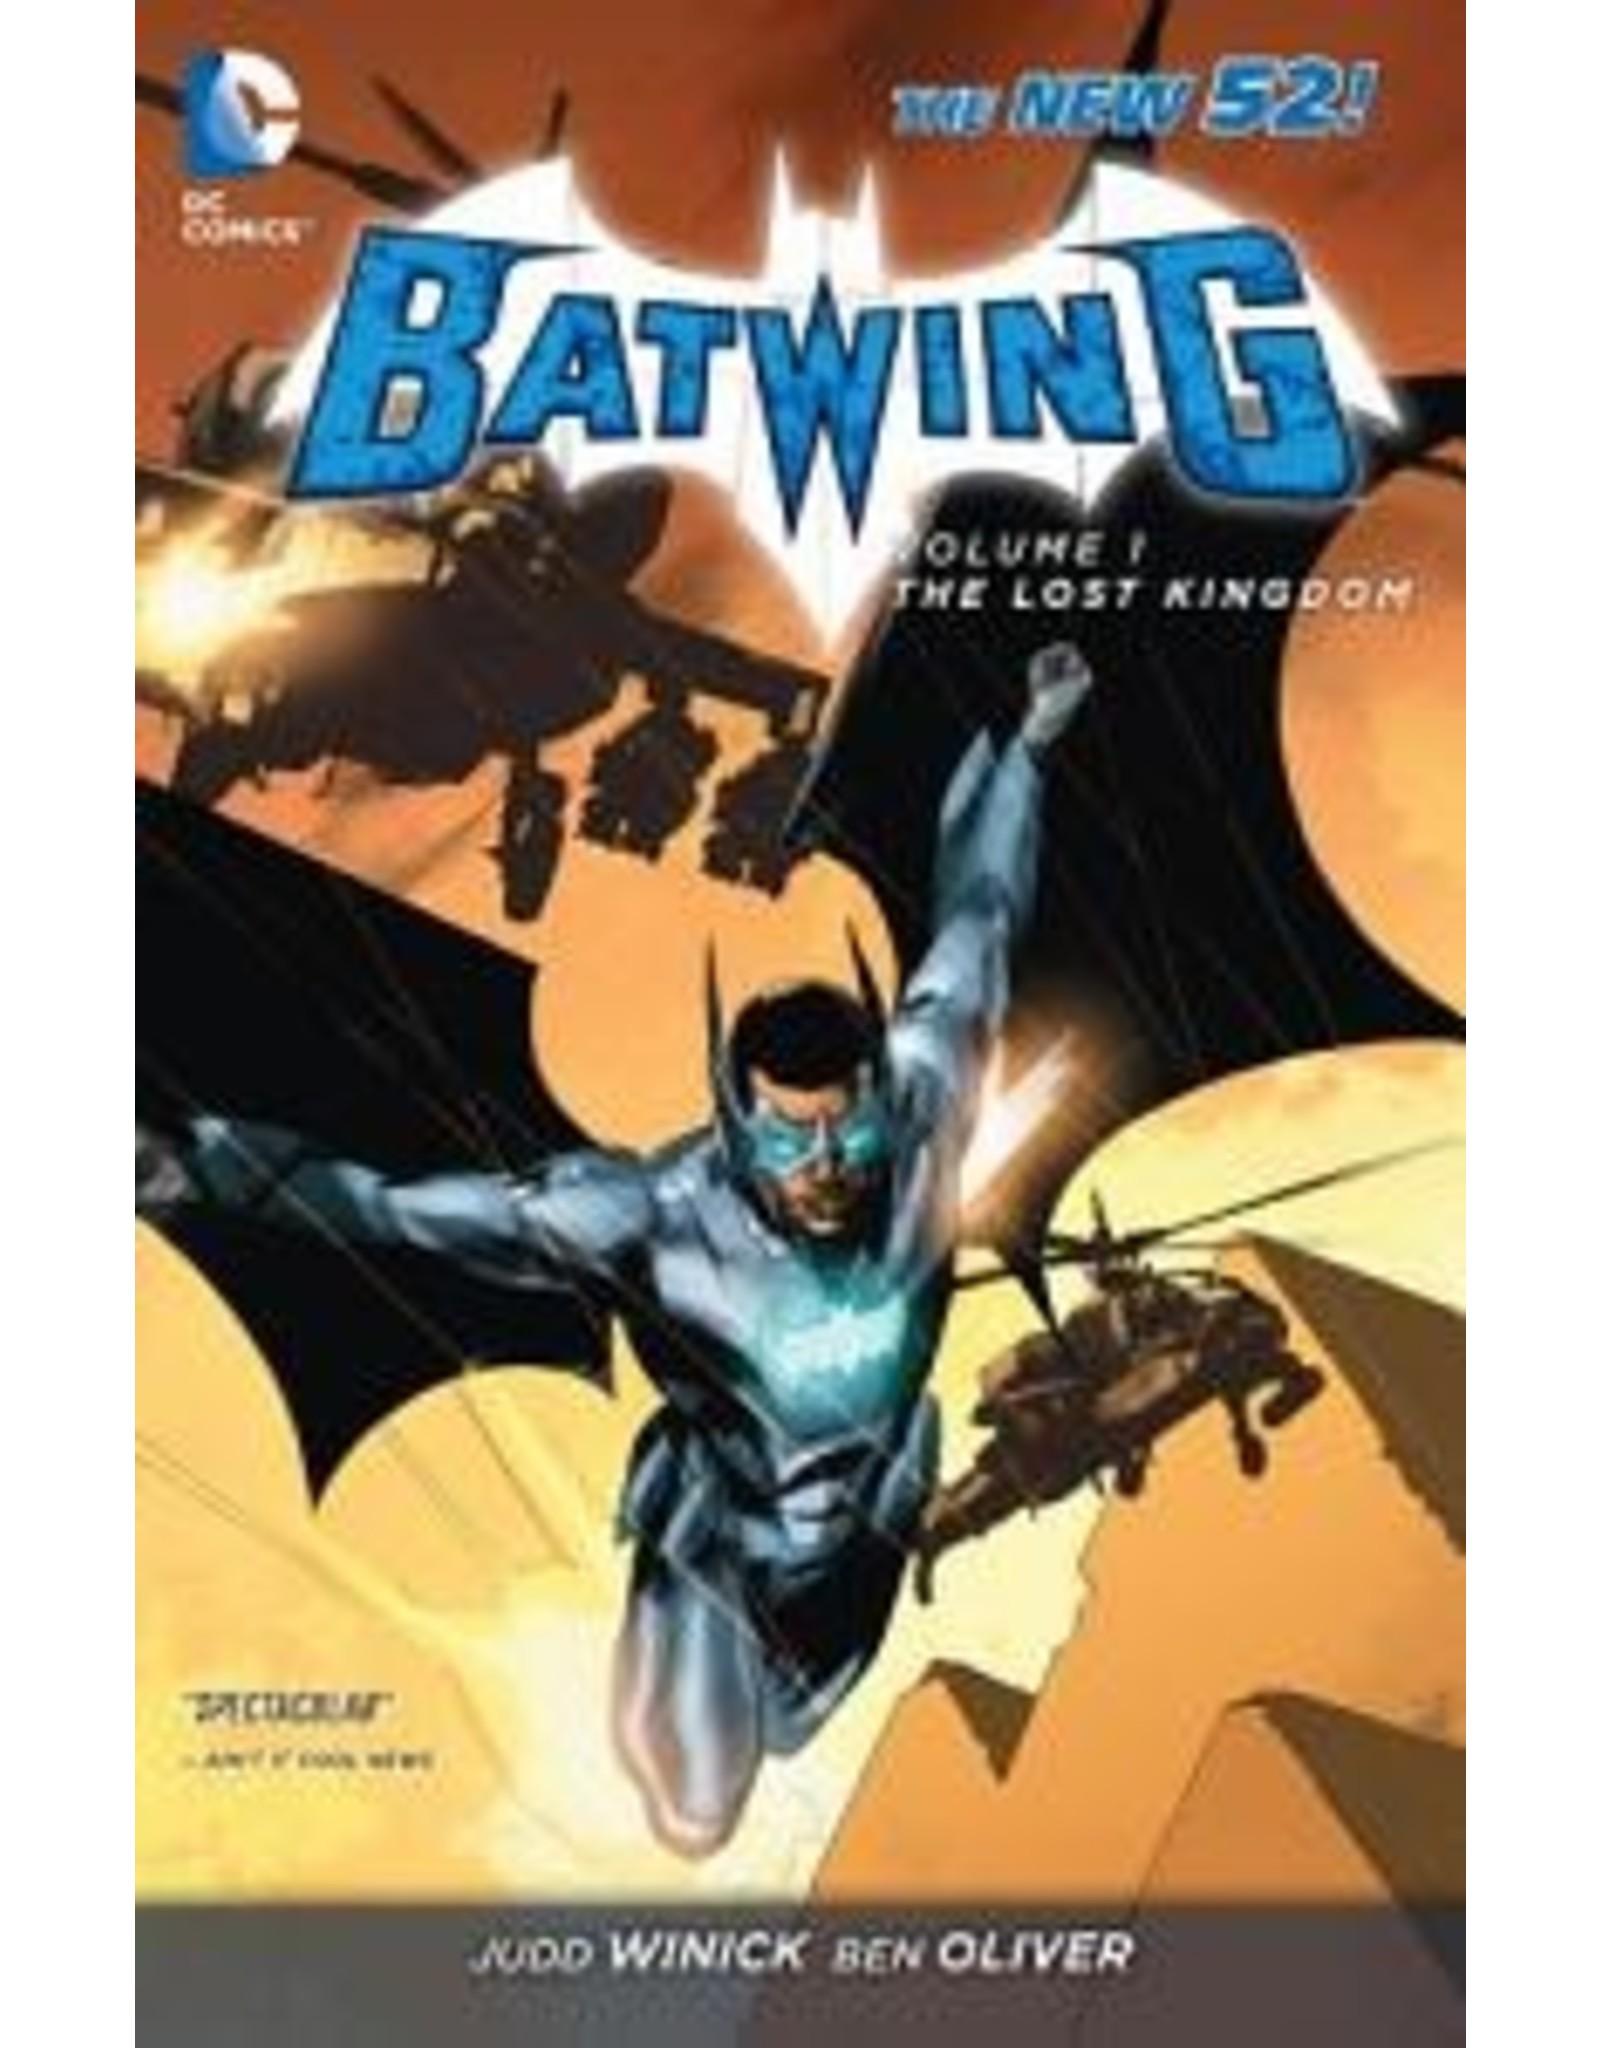 DC COMICS BATWING TP VOL 01 THE LOST KINGDOM